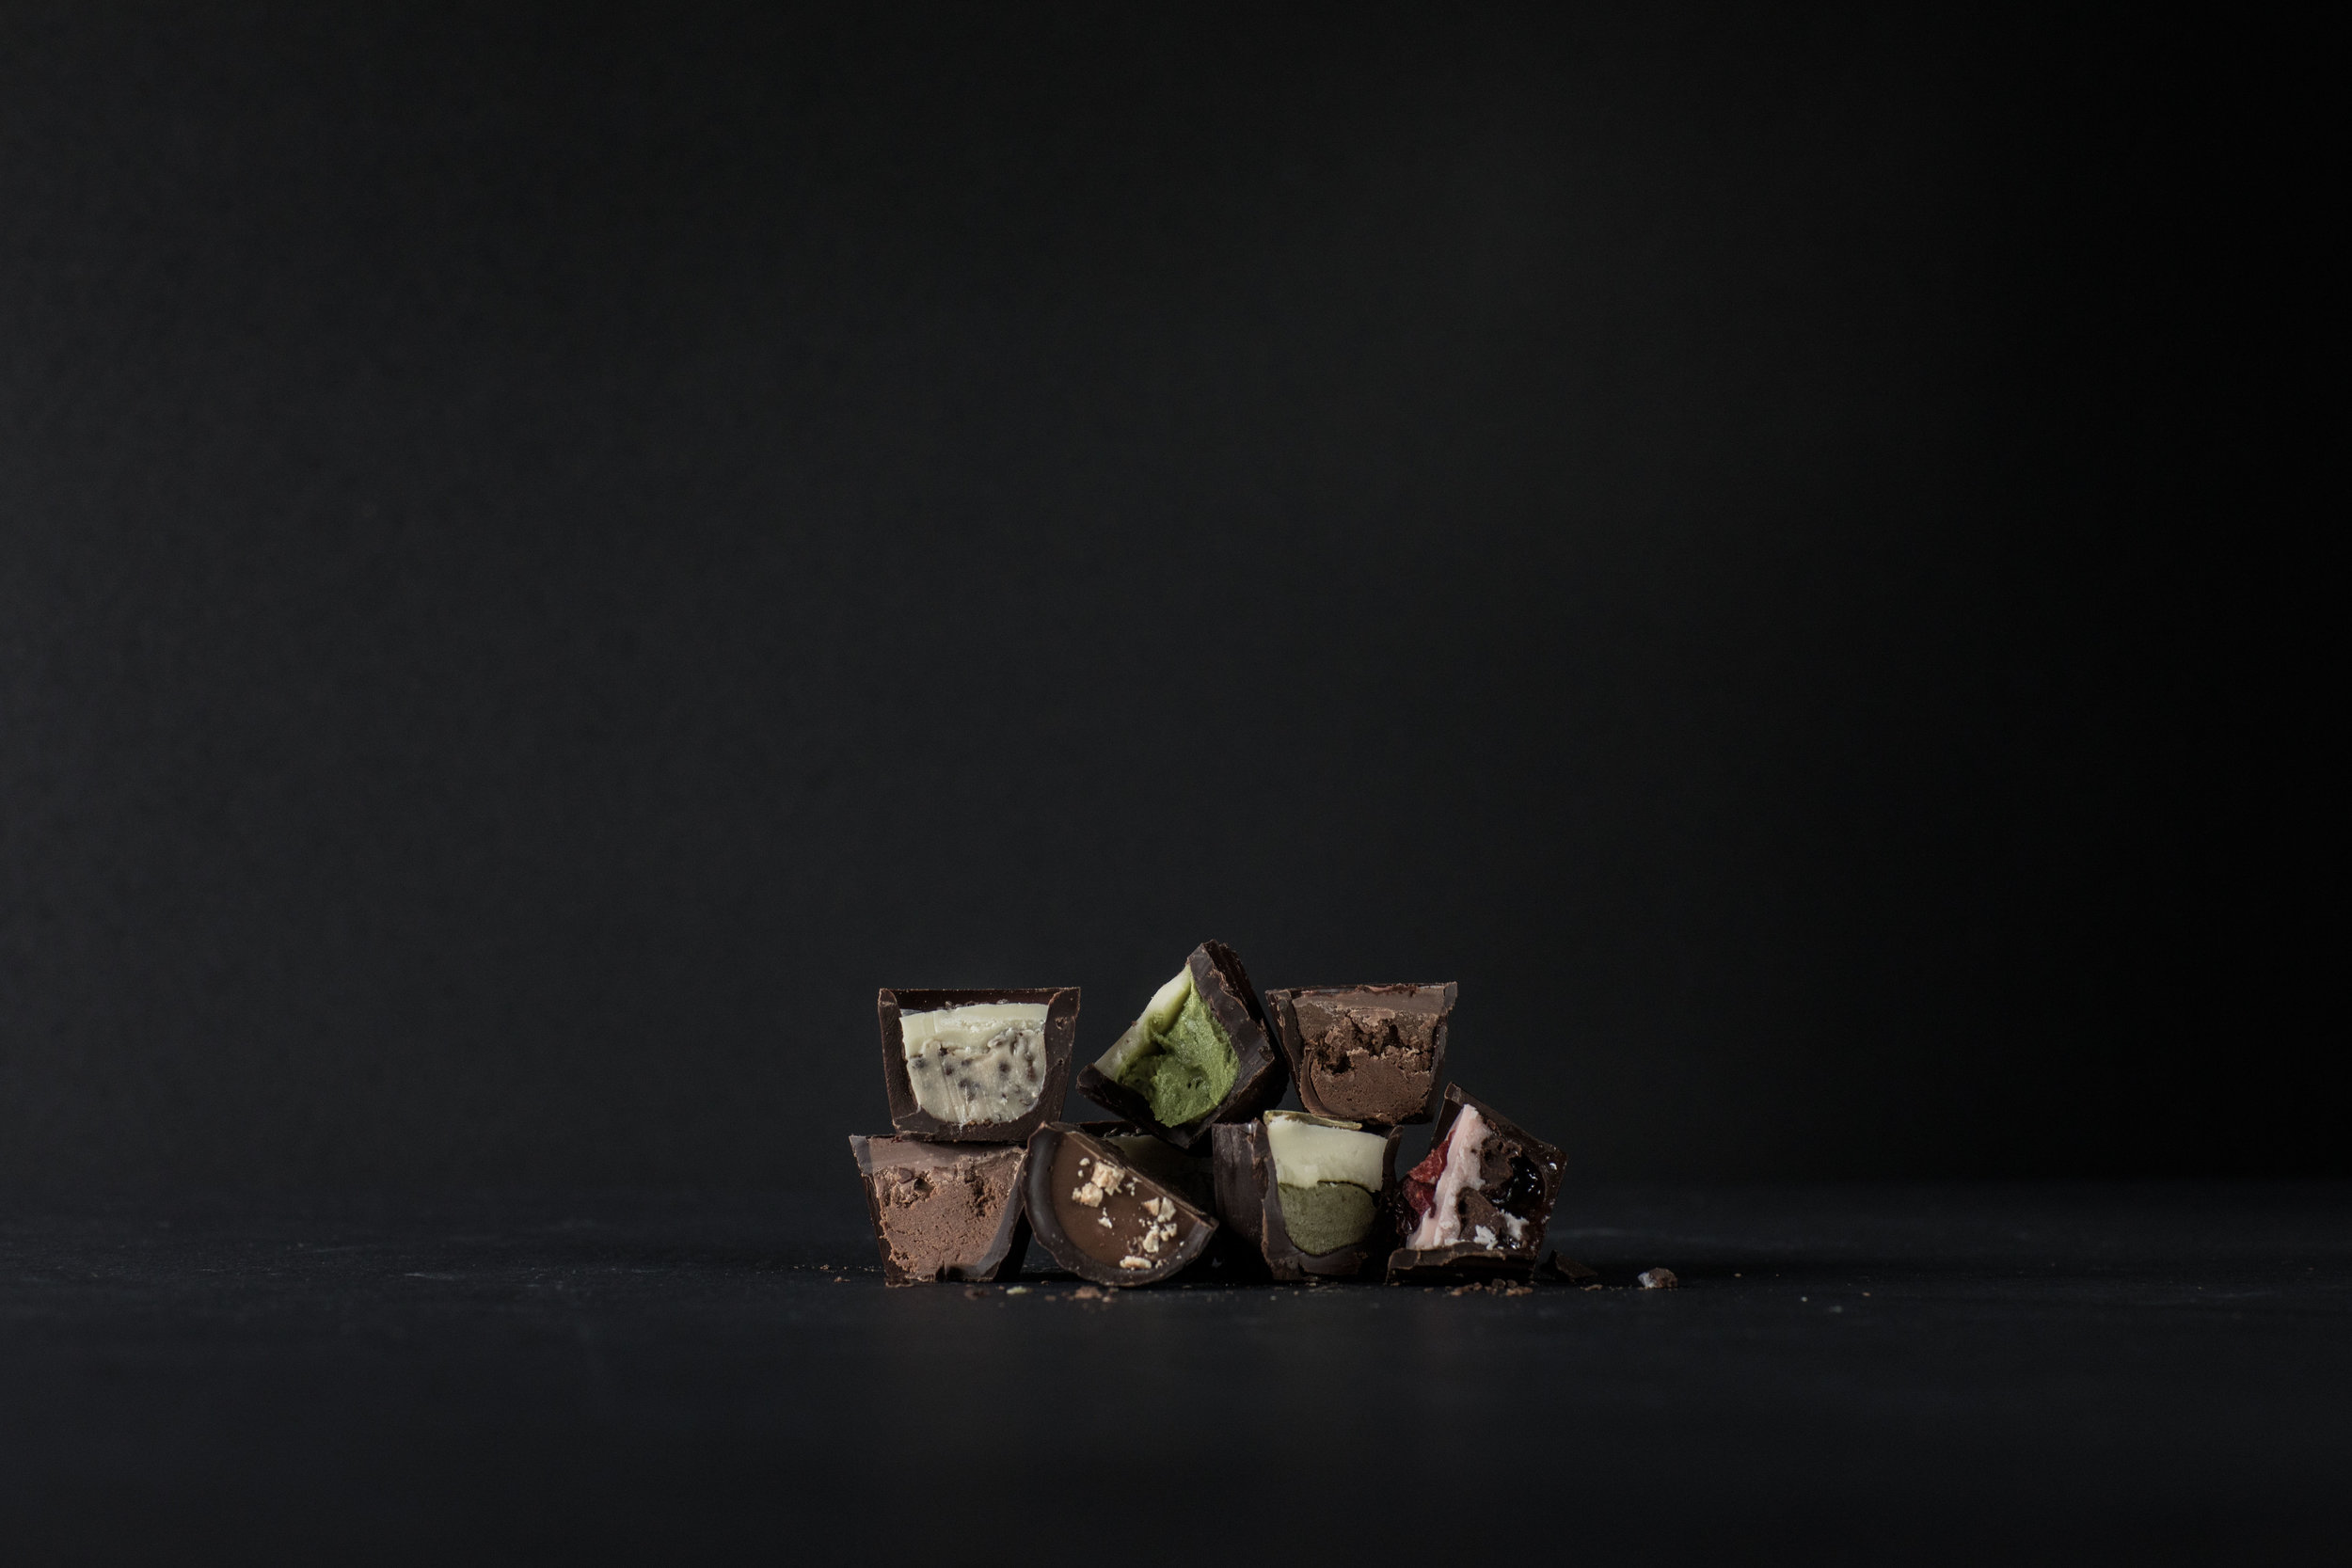 bovia-chocolate-samples-5071.jpg